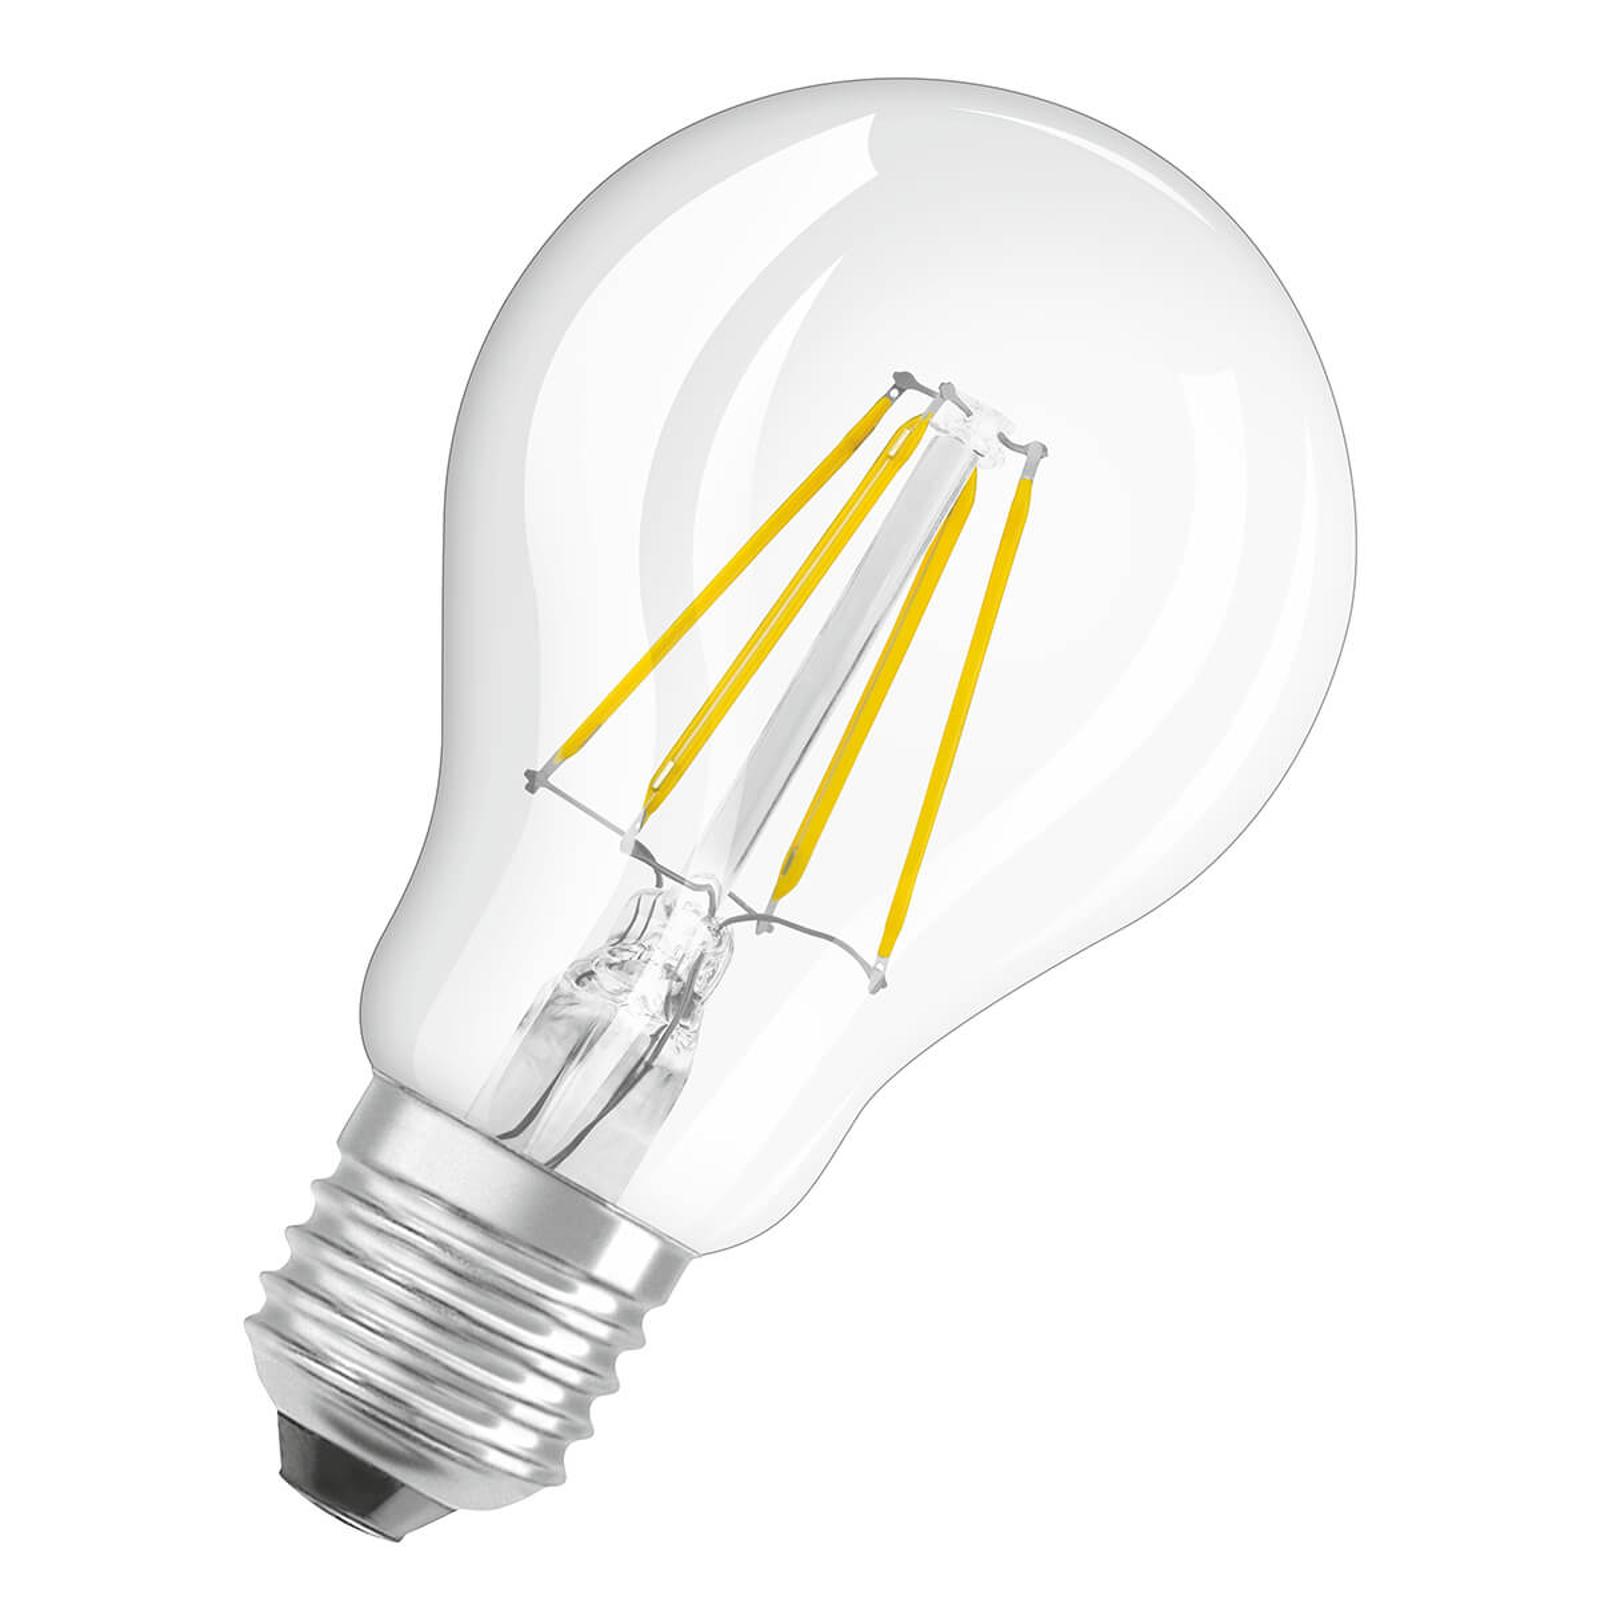 LED-Lampe E27 4W, universalweiß, 470 Lumen